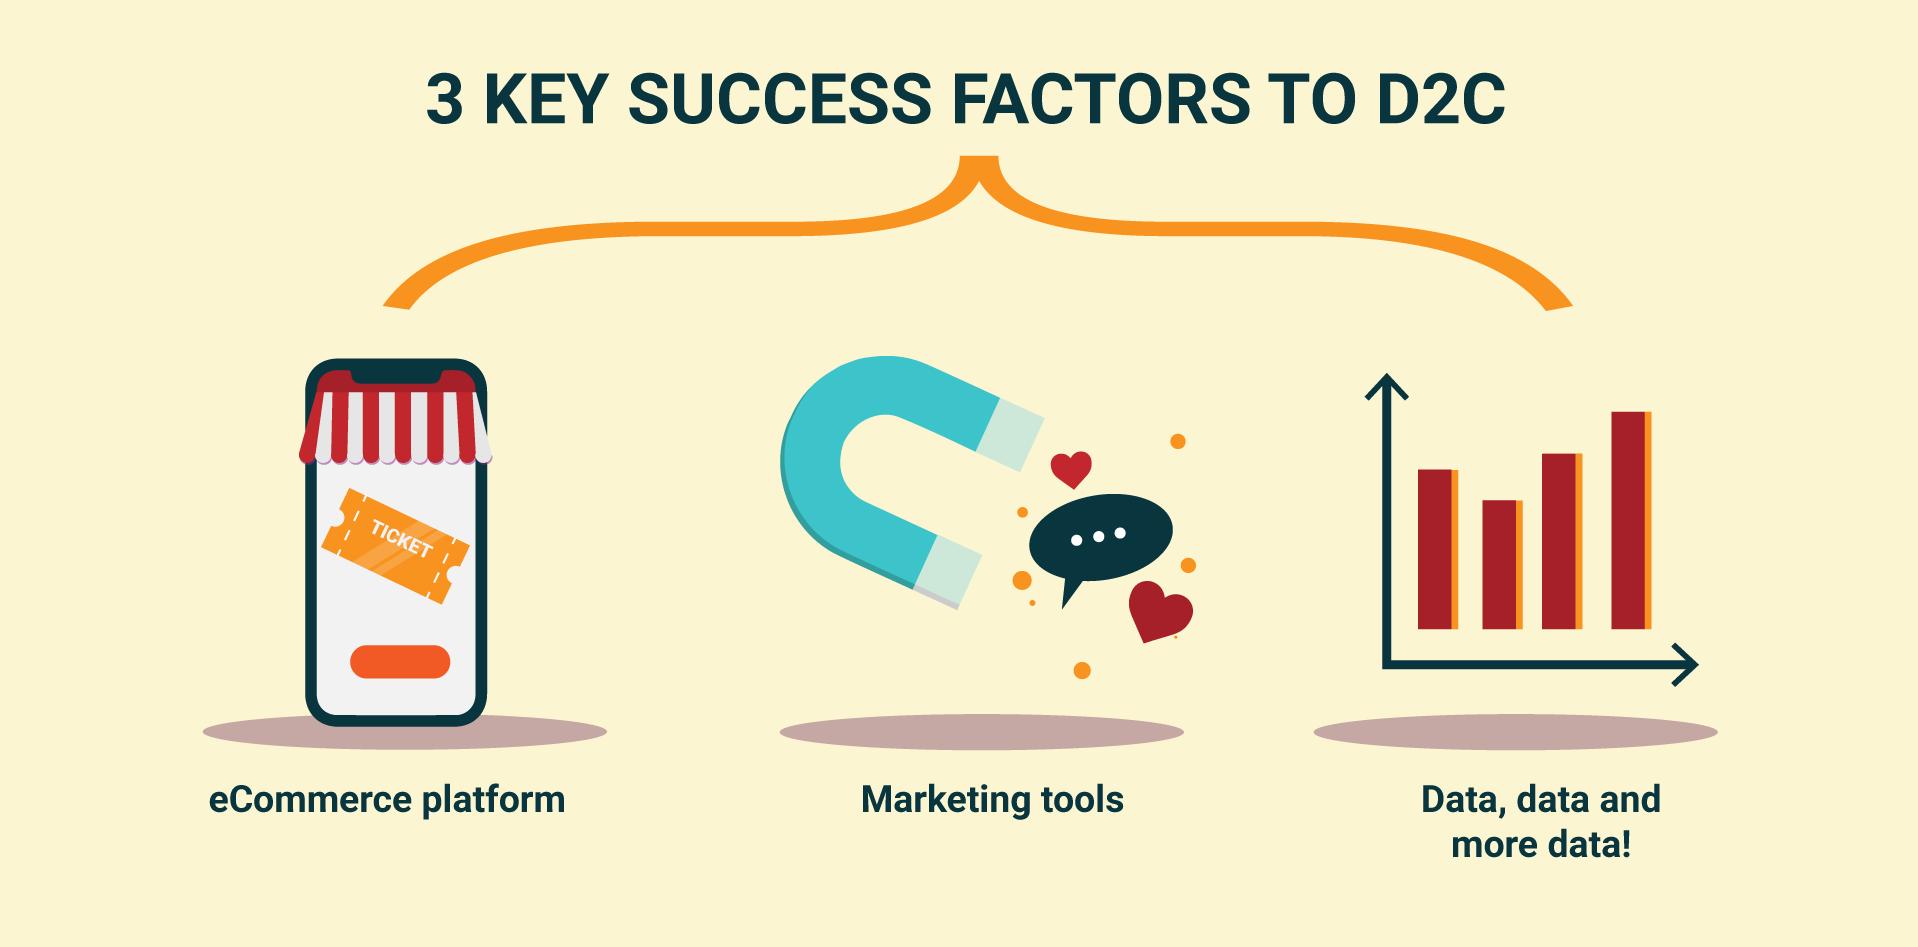 Direct To Consumer key success factors